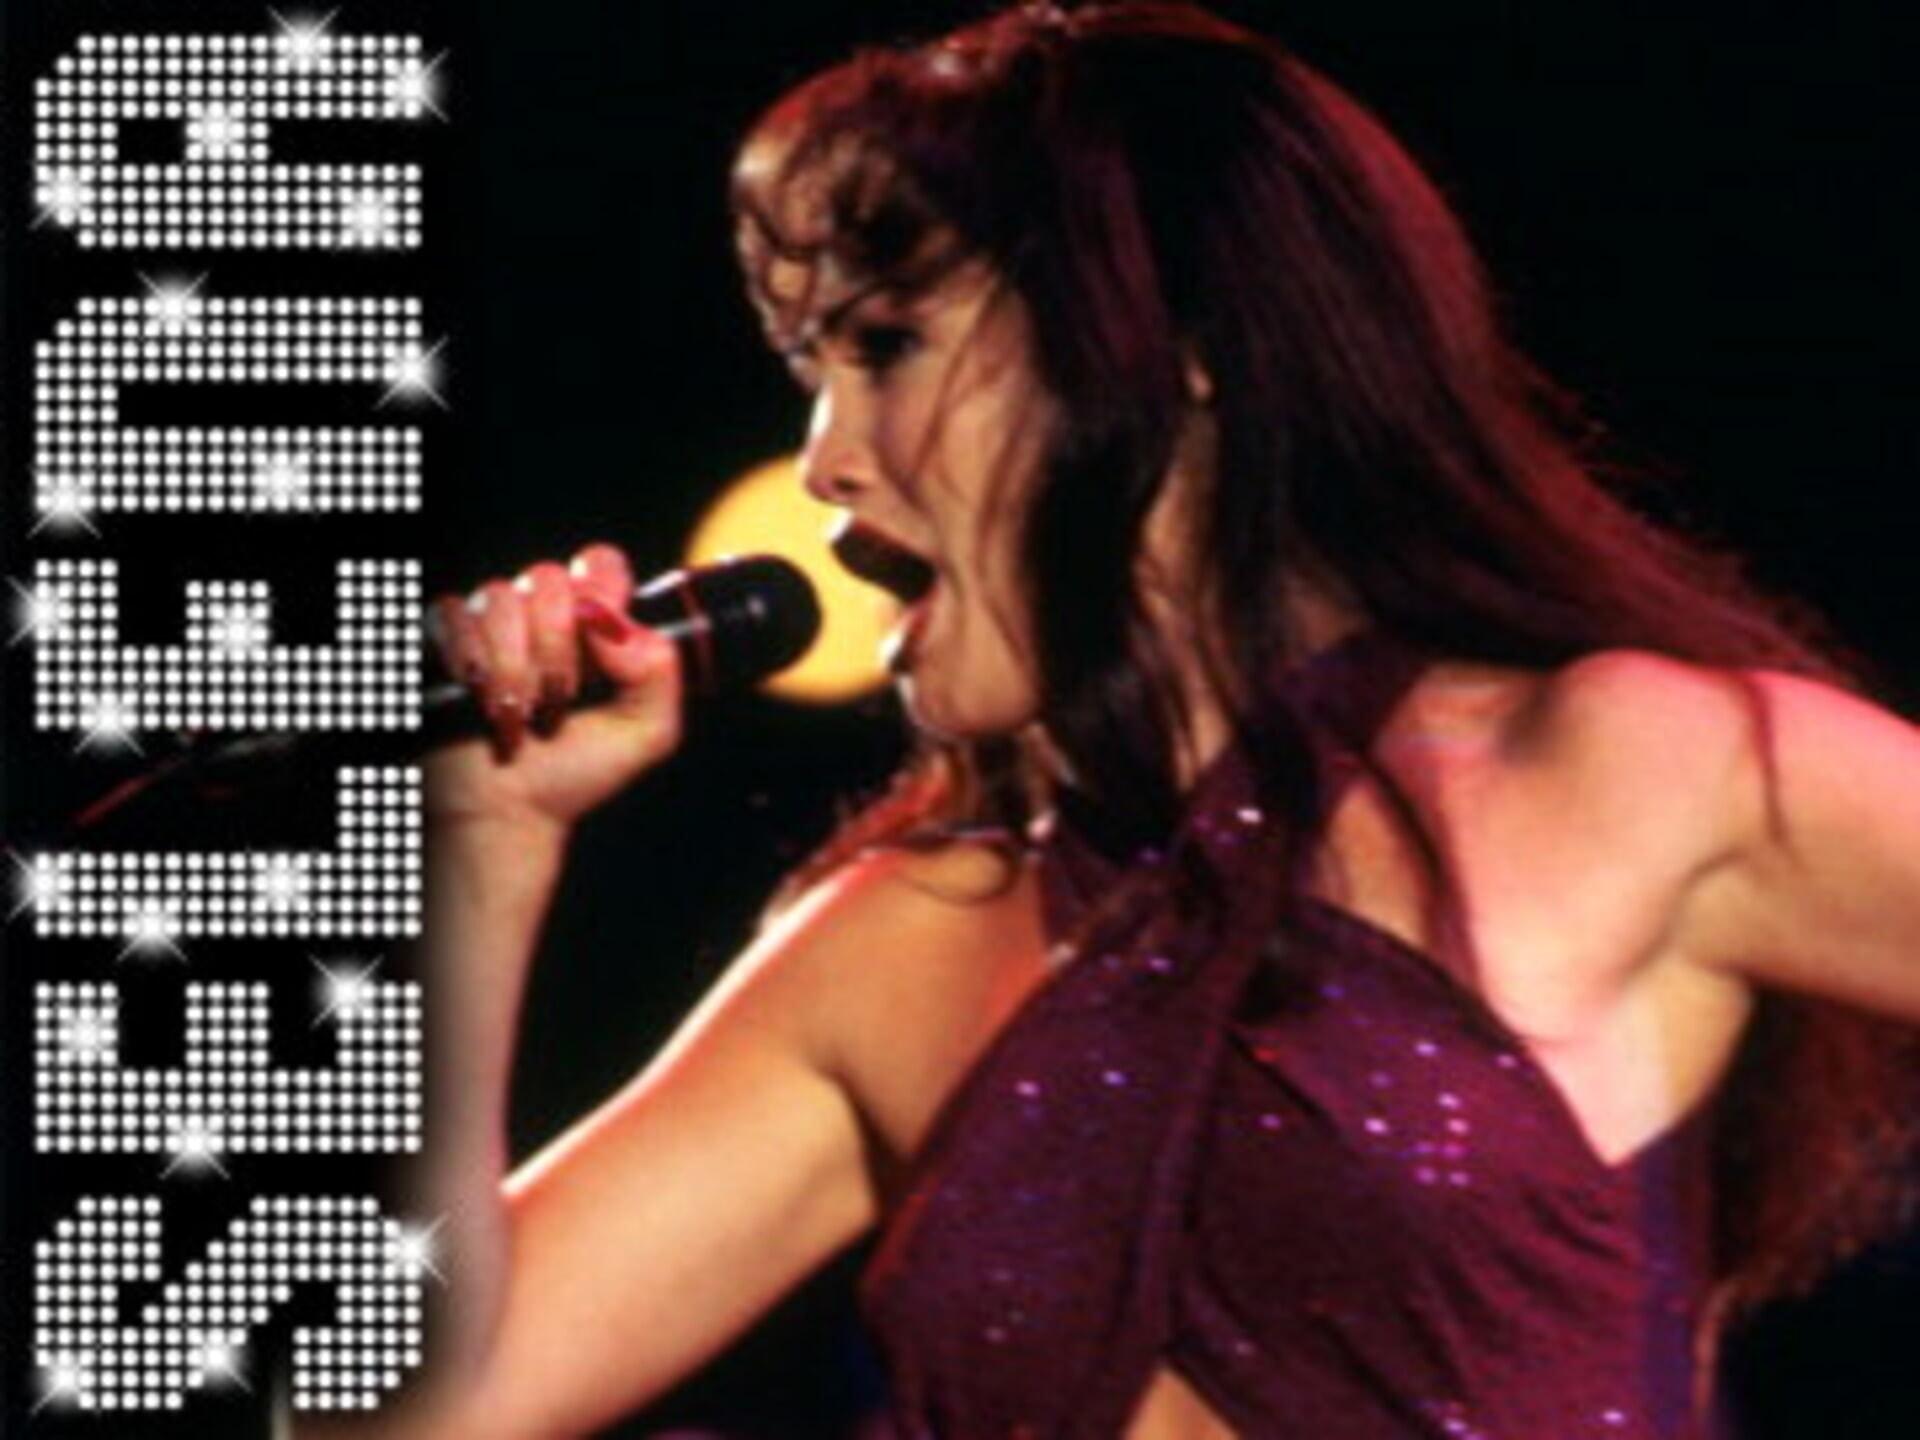 Selena - Image 1